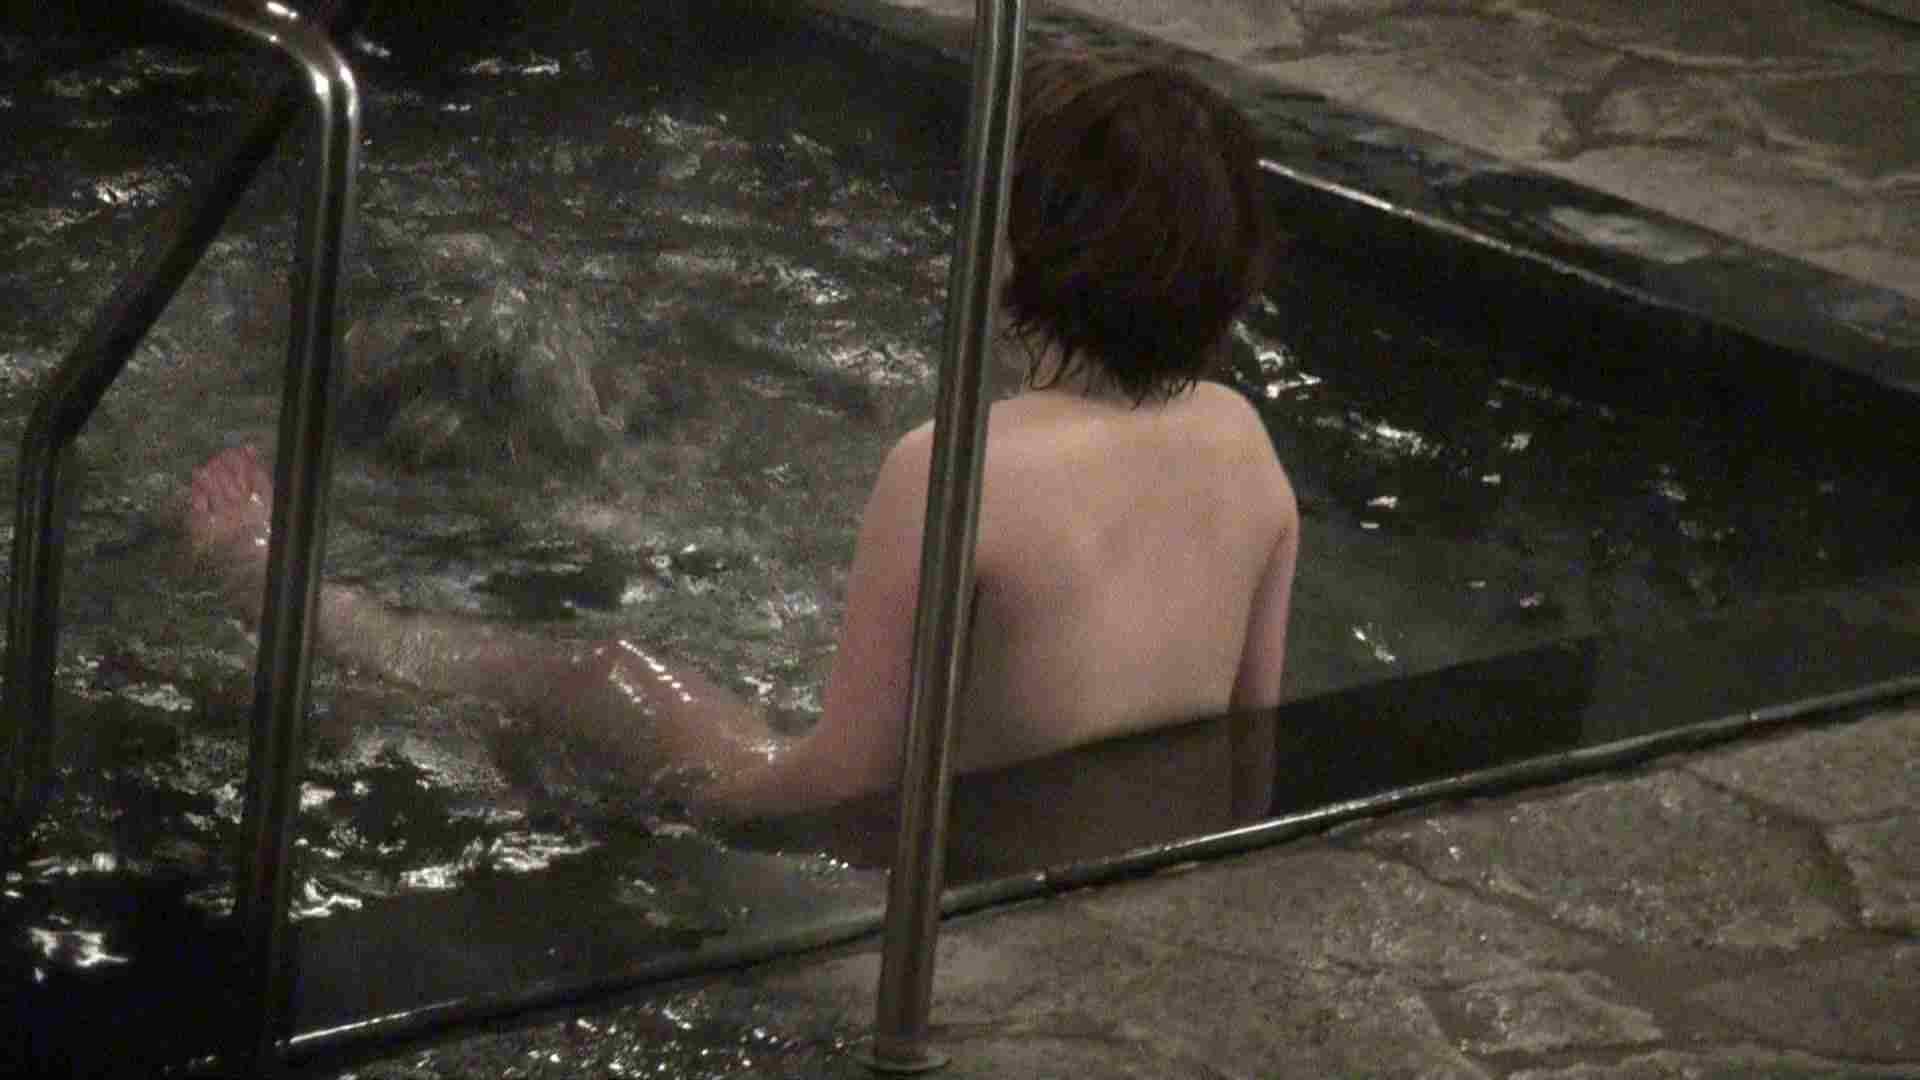 Aquaな露天風呂Vol.432 エッチな盗撮 オマンコ動画キャプチャ 111pic 48